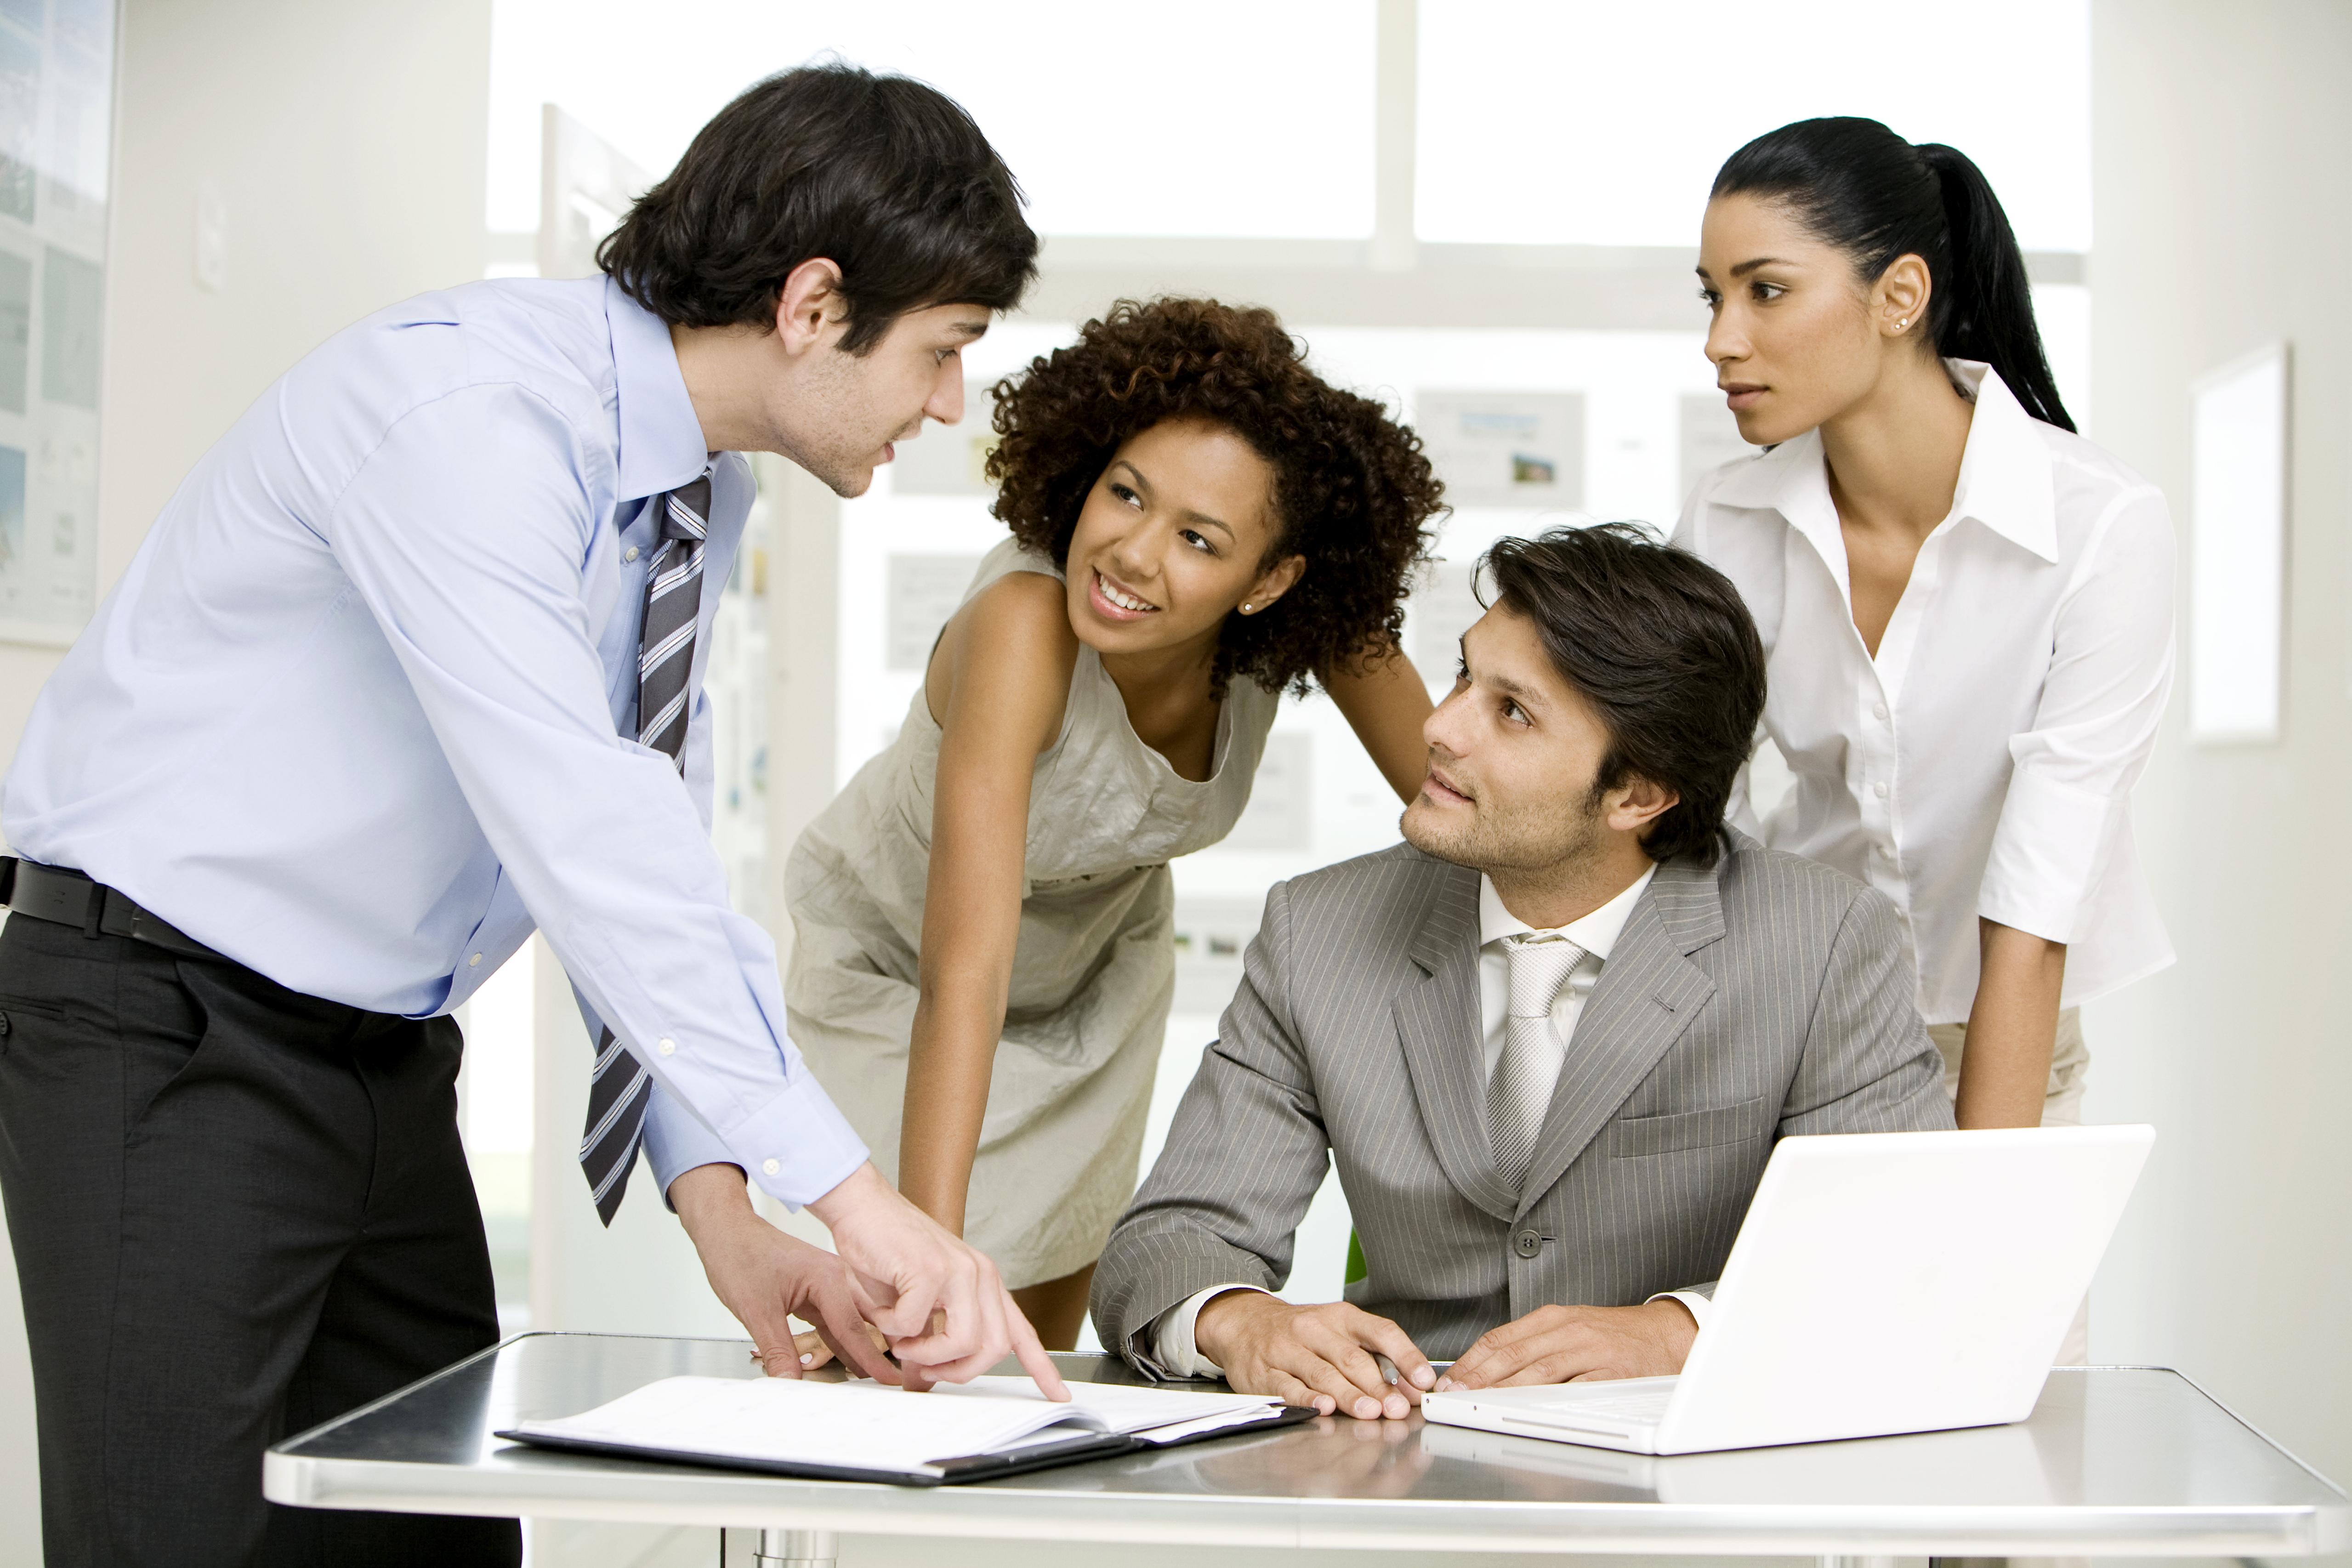 conseils langues   les jobs et stages  u00e0 l u0026 39  u00e9tranger